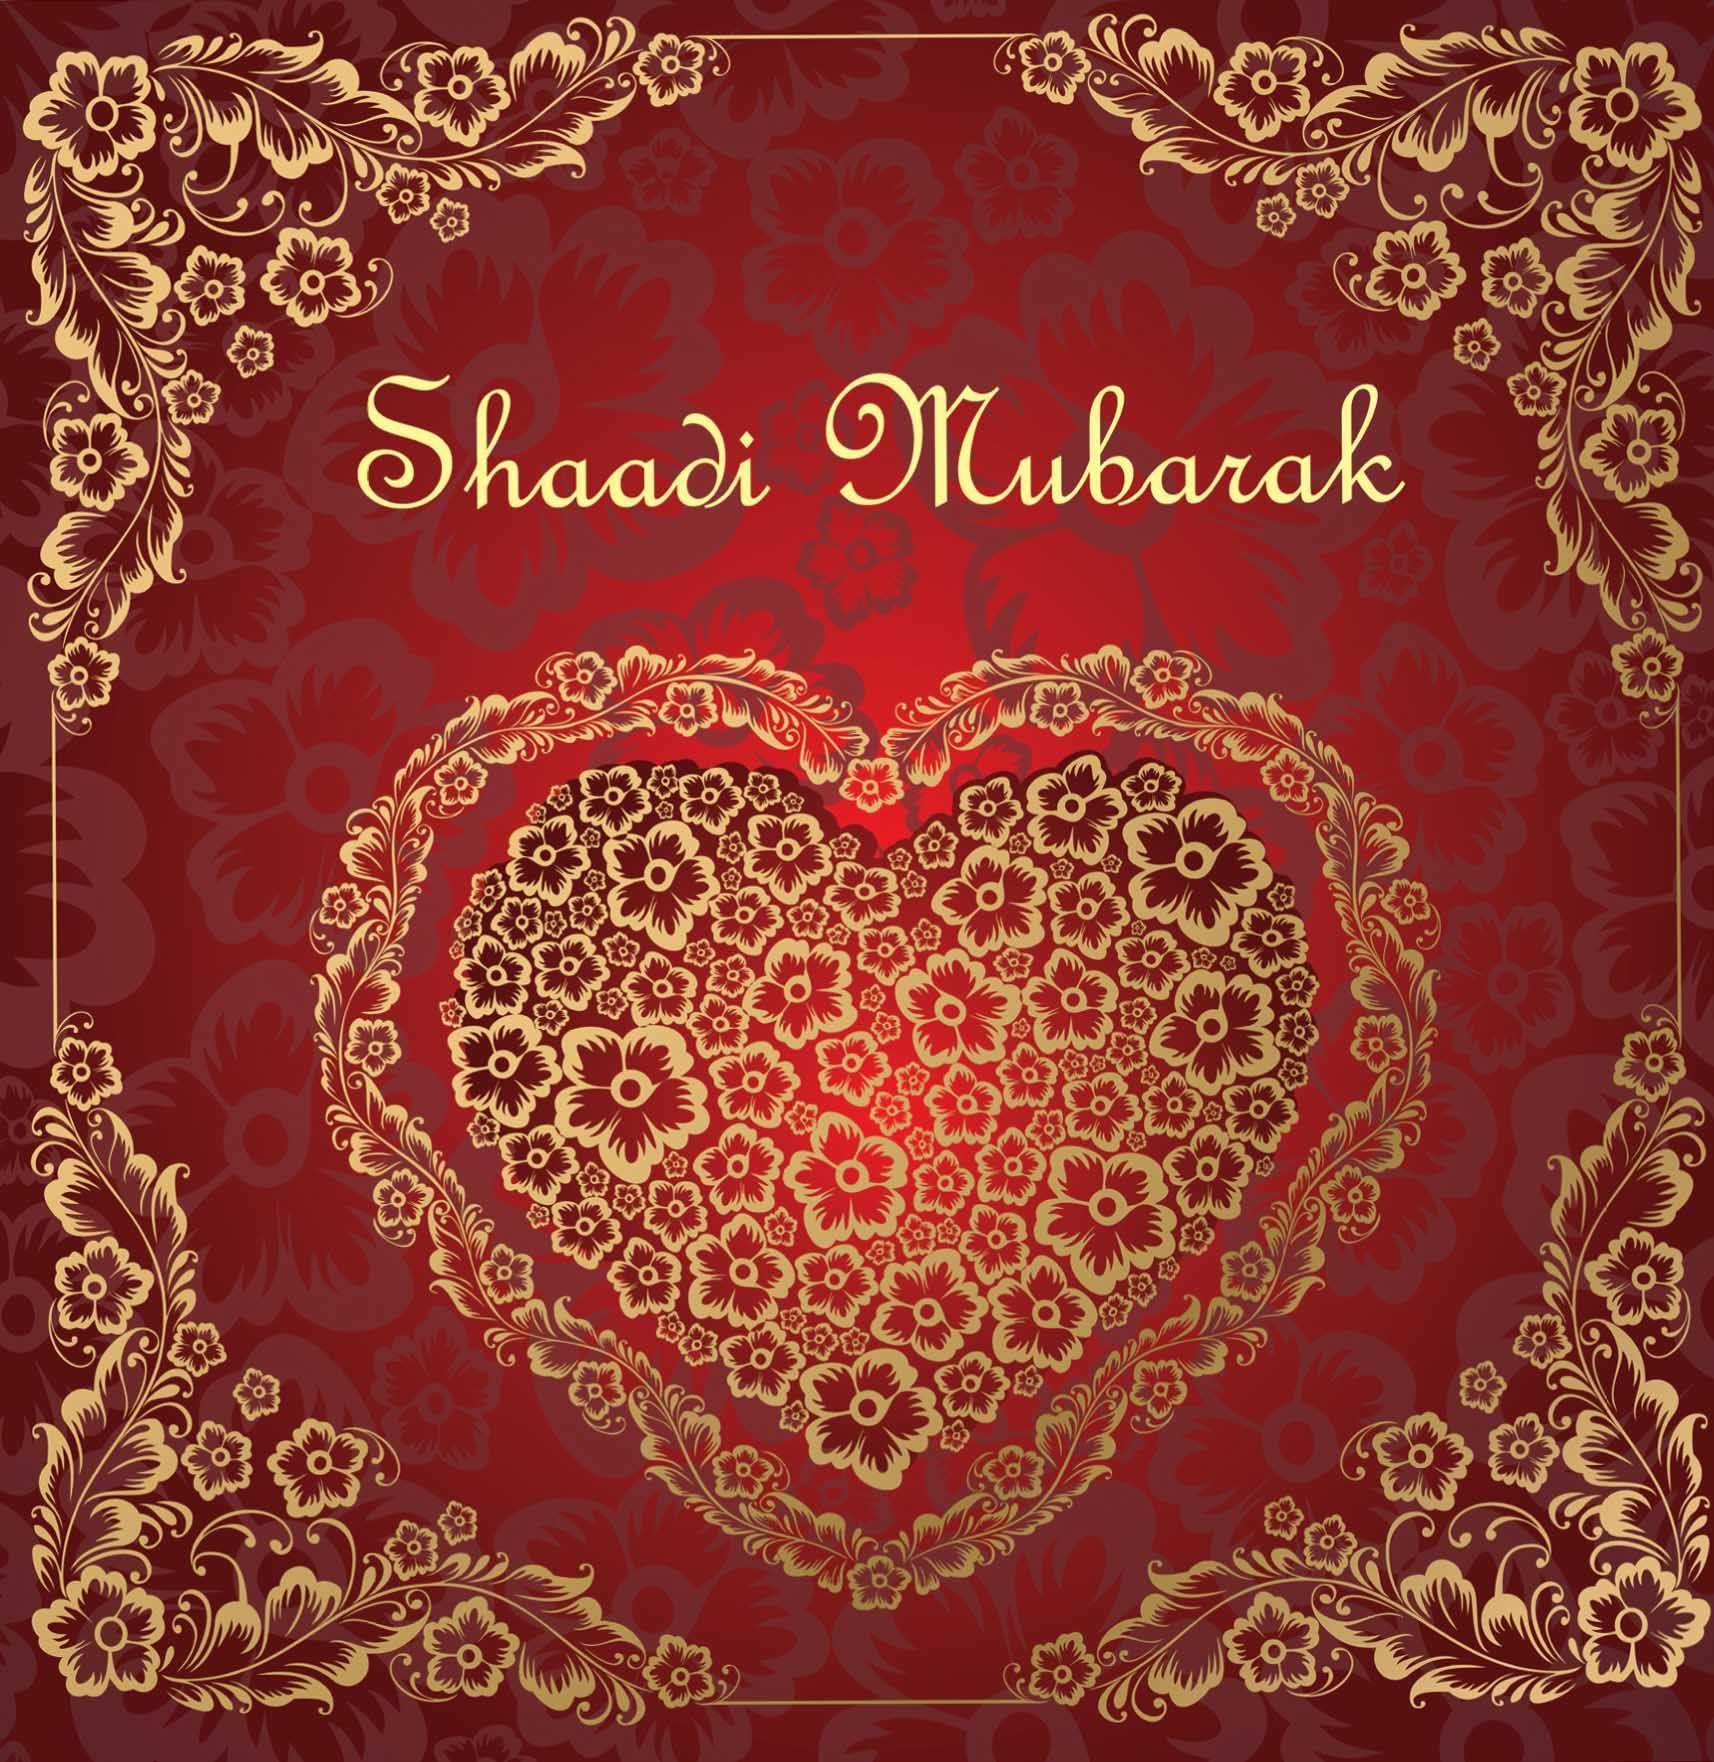 Shaadi Mubarak Islamic Greeting Cards Cards, Greeting